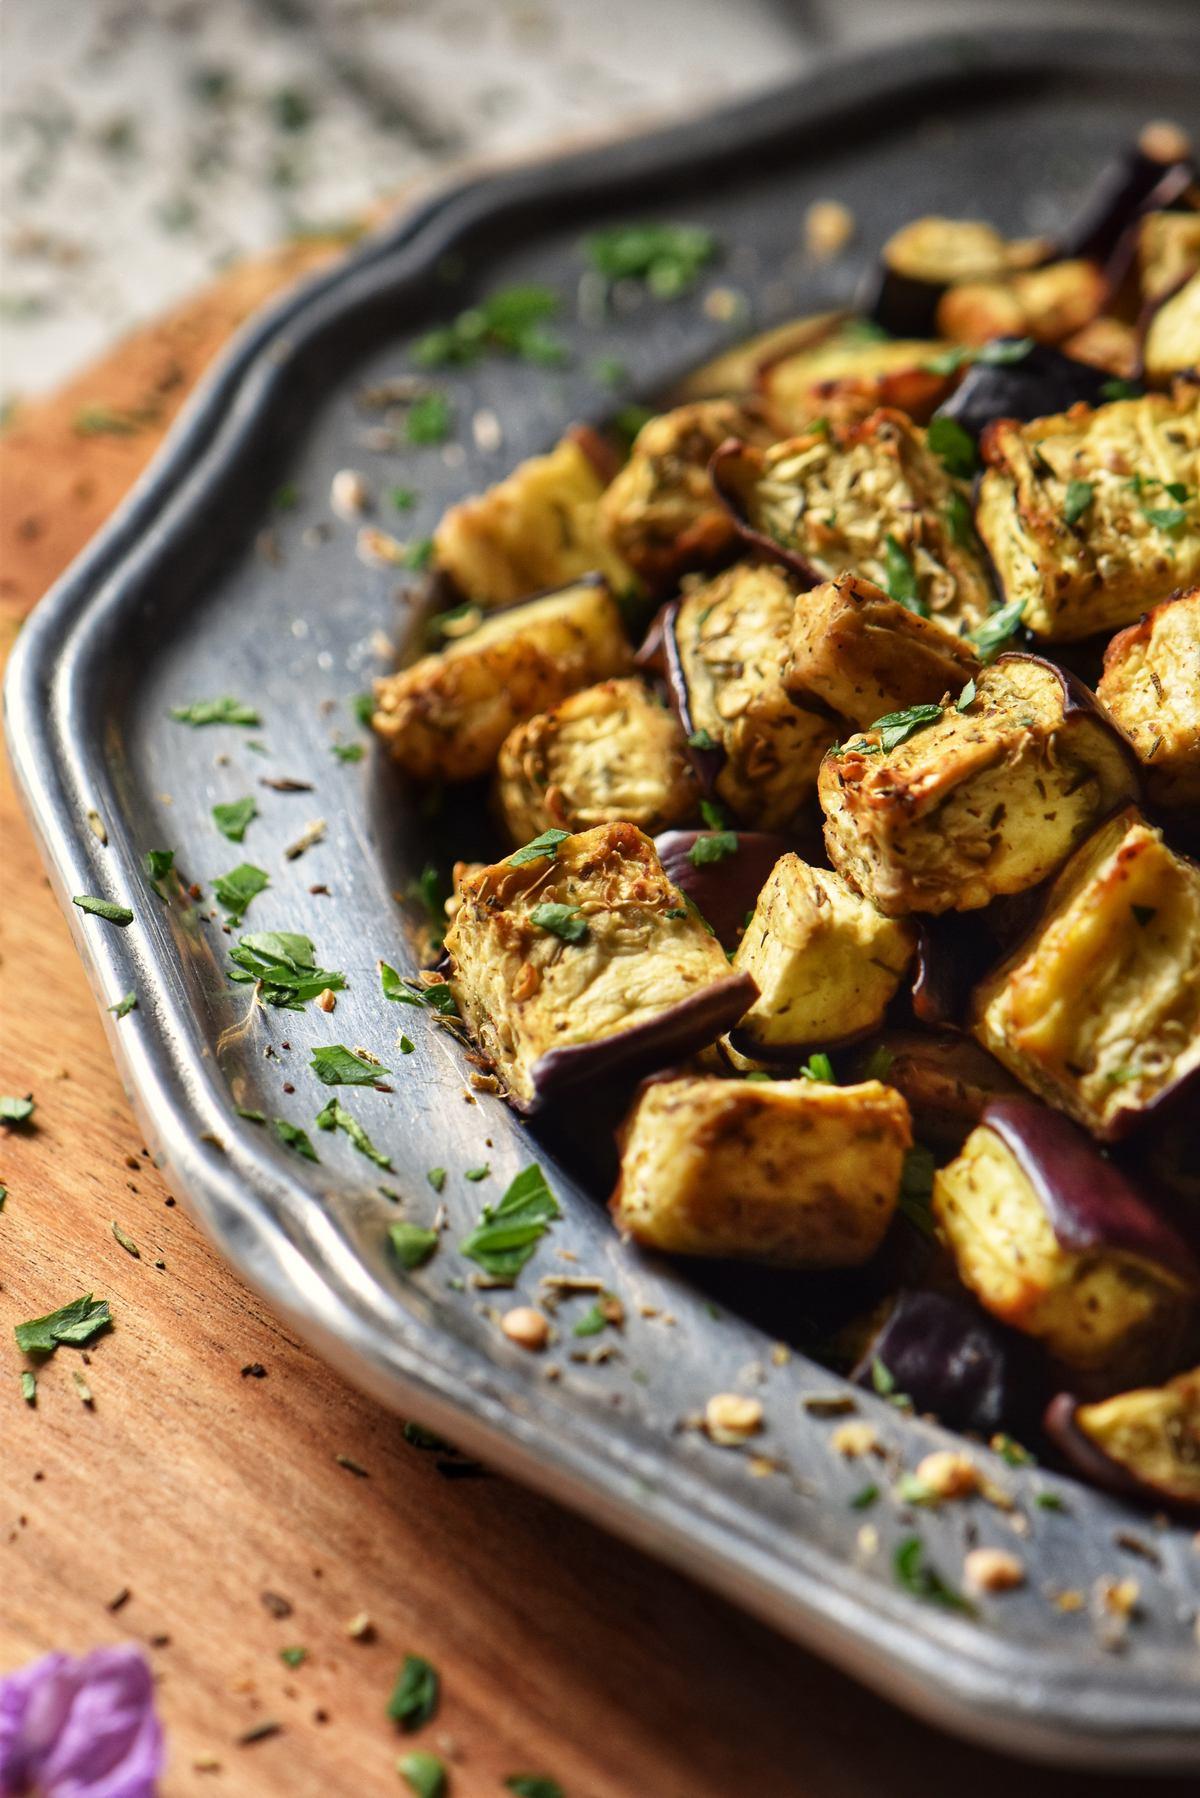 Lightly seasoned eggplant cubes on a silver platter.